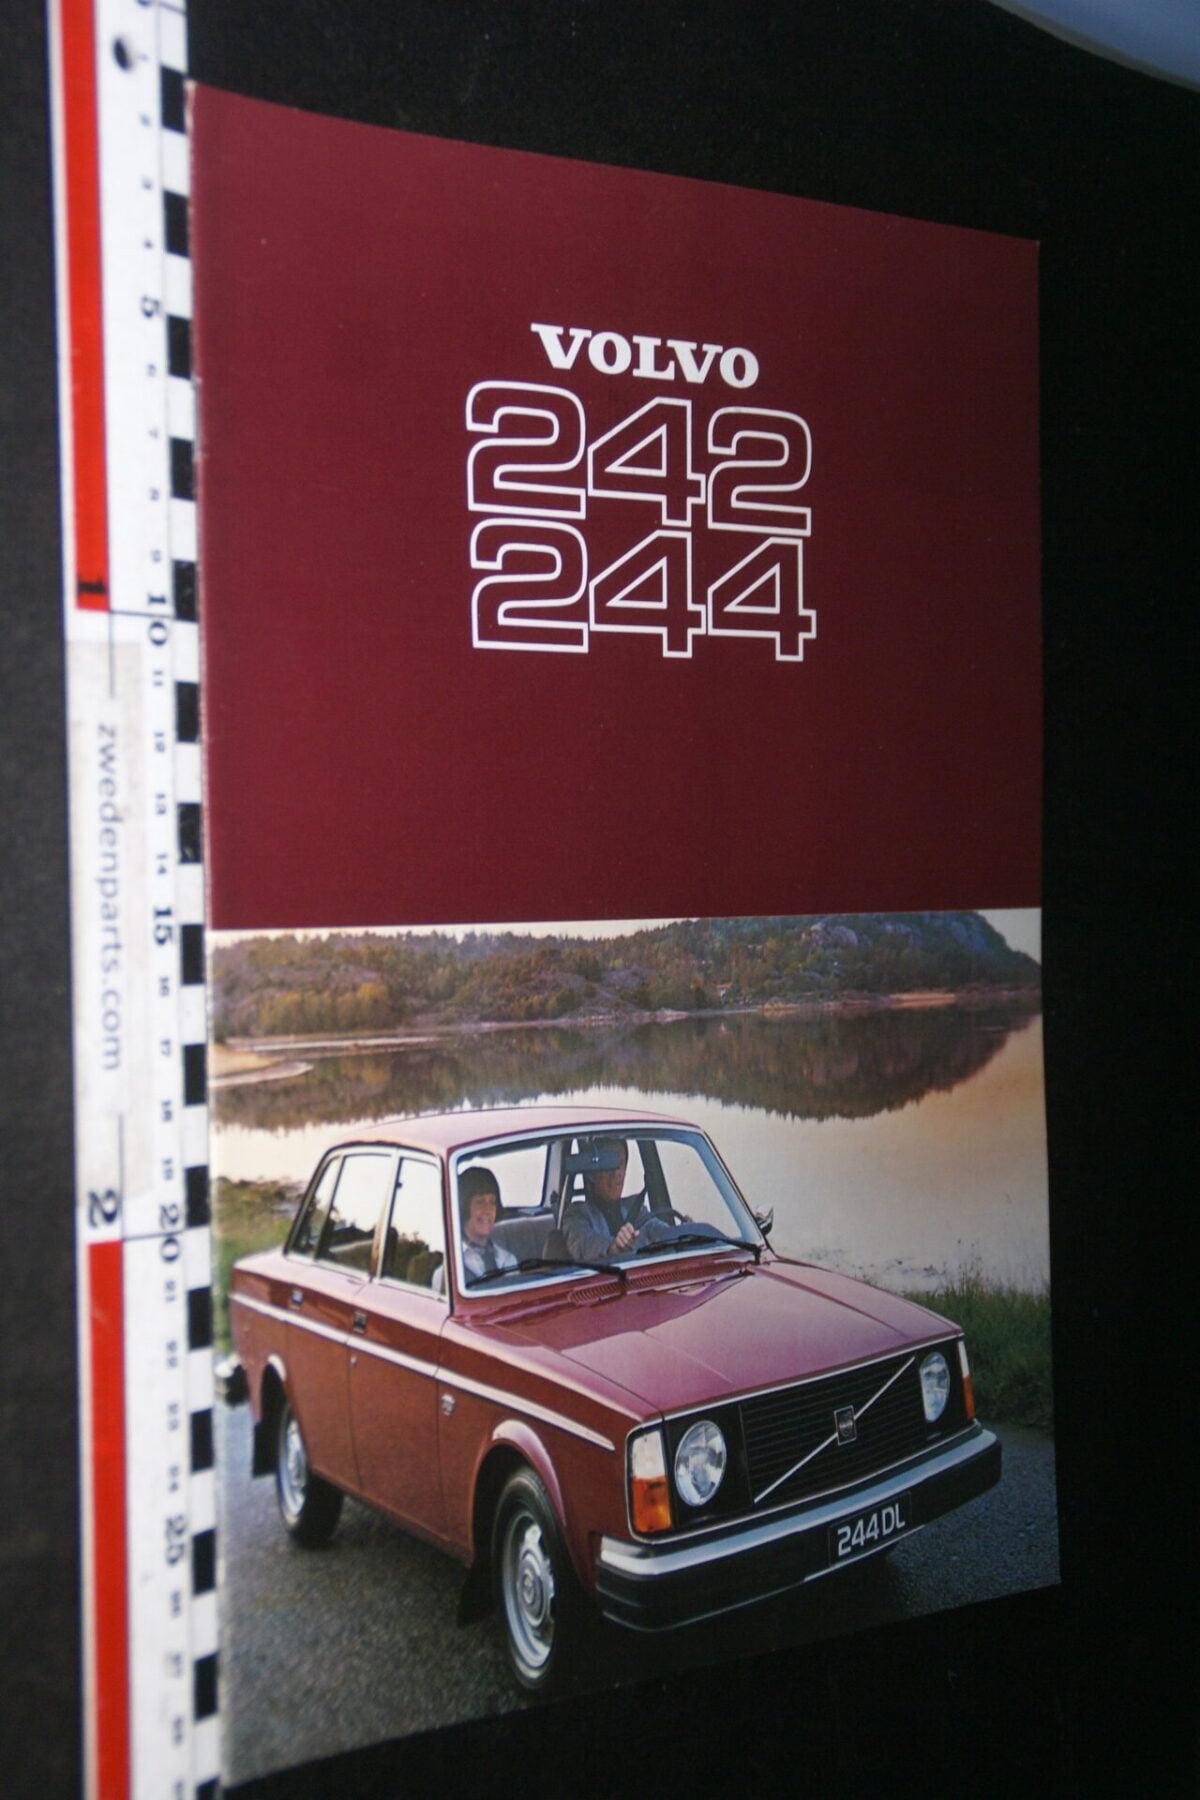 DSC07660 1977 originele brochure Volvo 242 244 nr RSPPV 4021-2-47fcc9ad